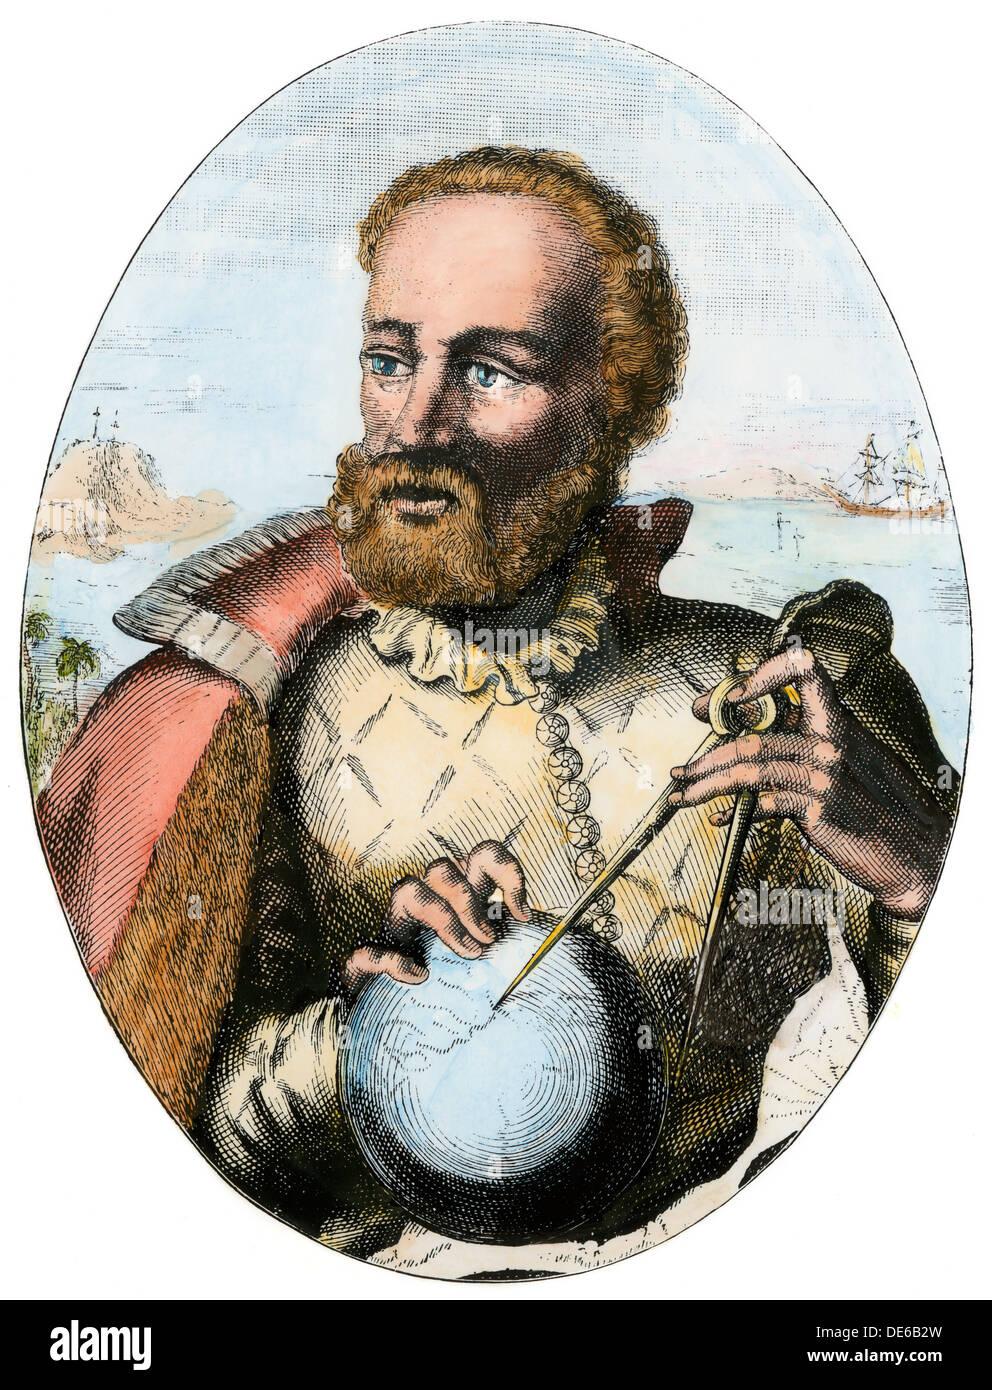 Portuguese explorer Ferdinand Magellan holding navigation instruments. - Stock Image